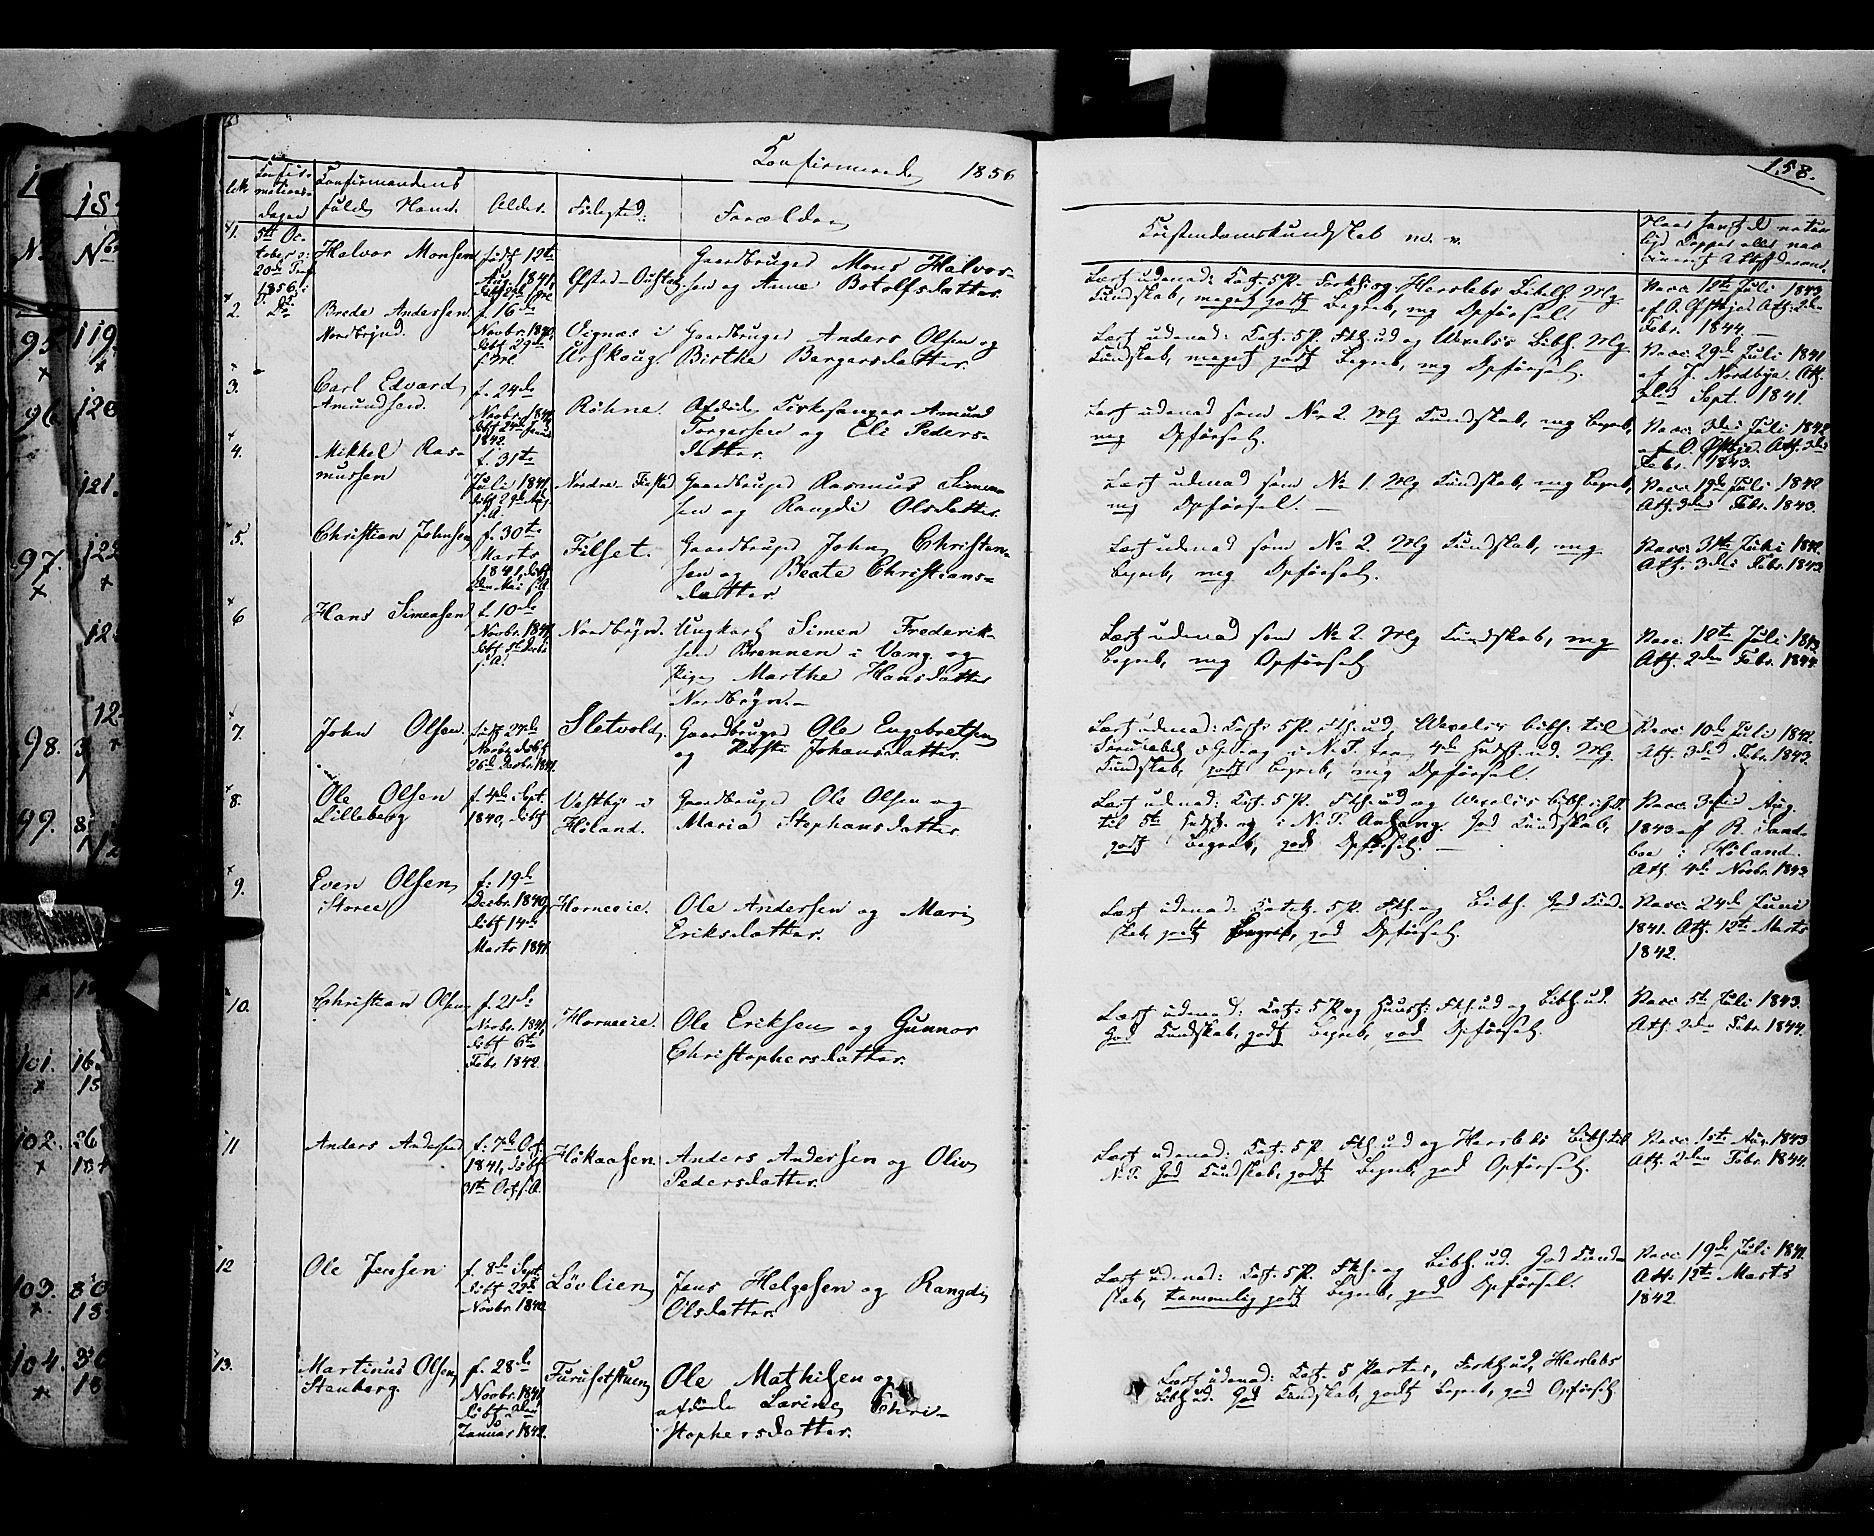 SAH, Romedal prestekontor, K/L0004: Ministerialbok nr. 4, 1847-1861, s. 158